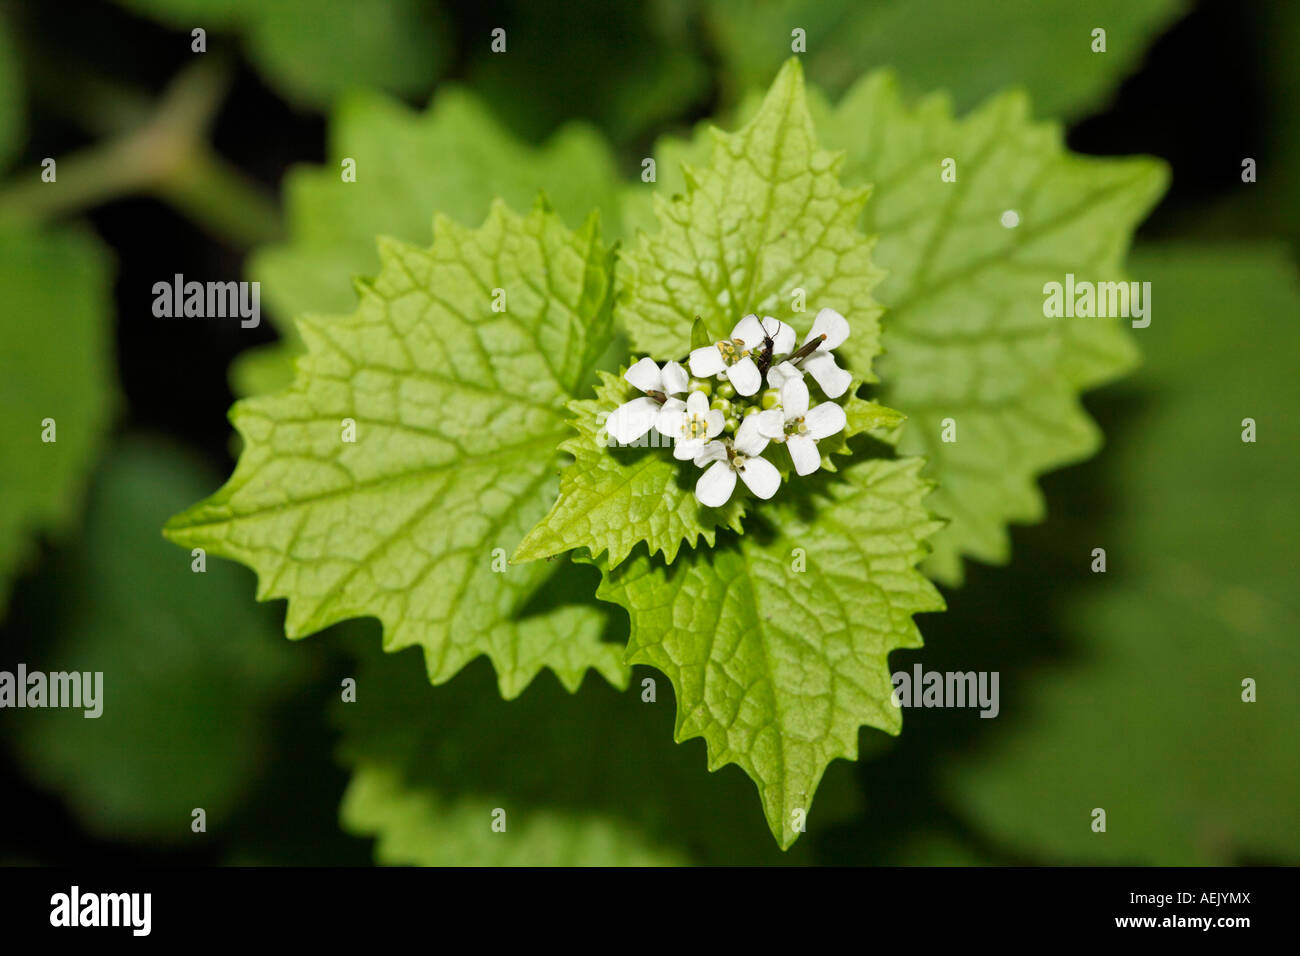 Alliaria petiolata ajo, Mostaza Foto de stock